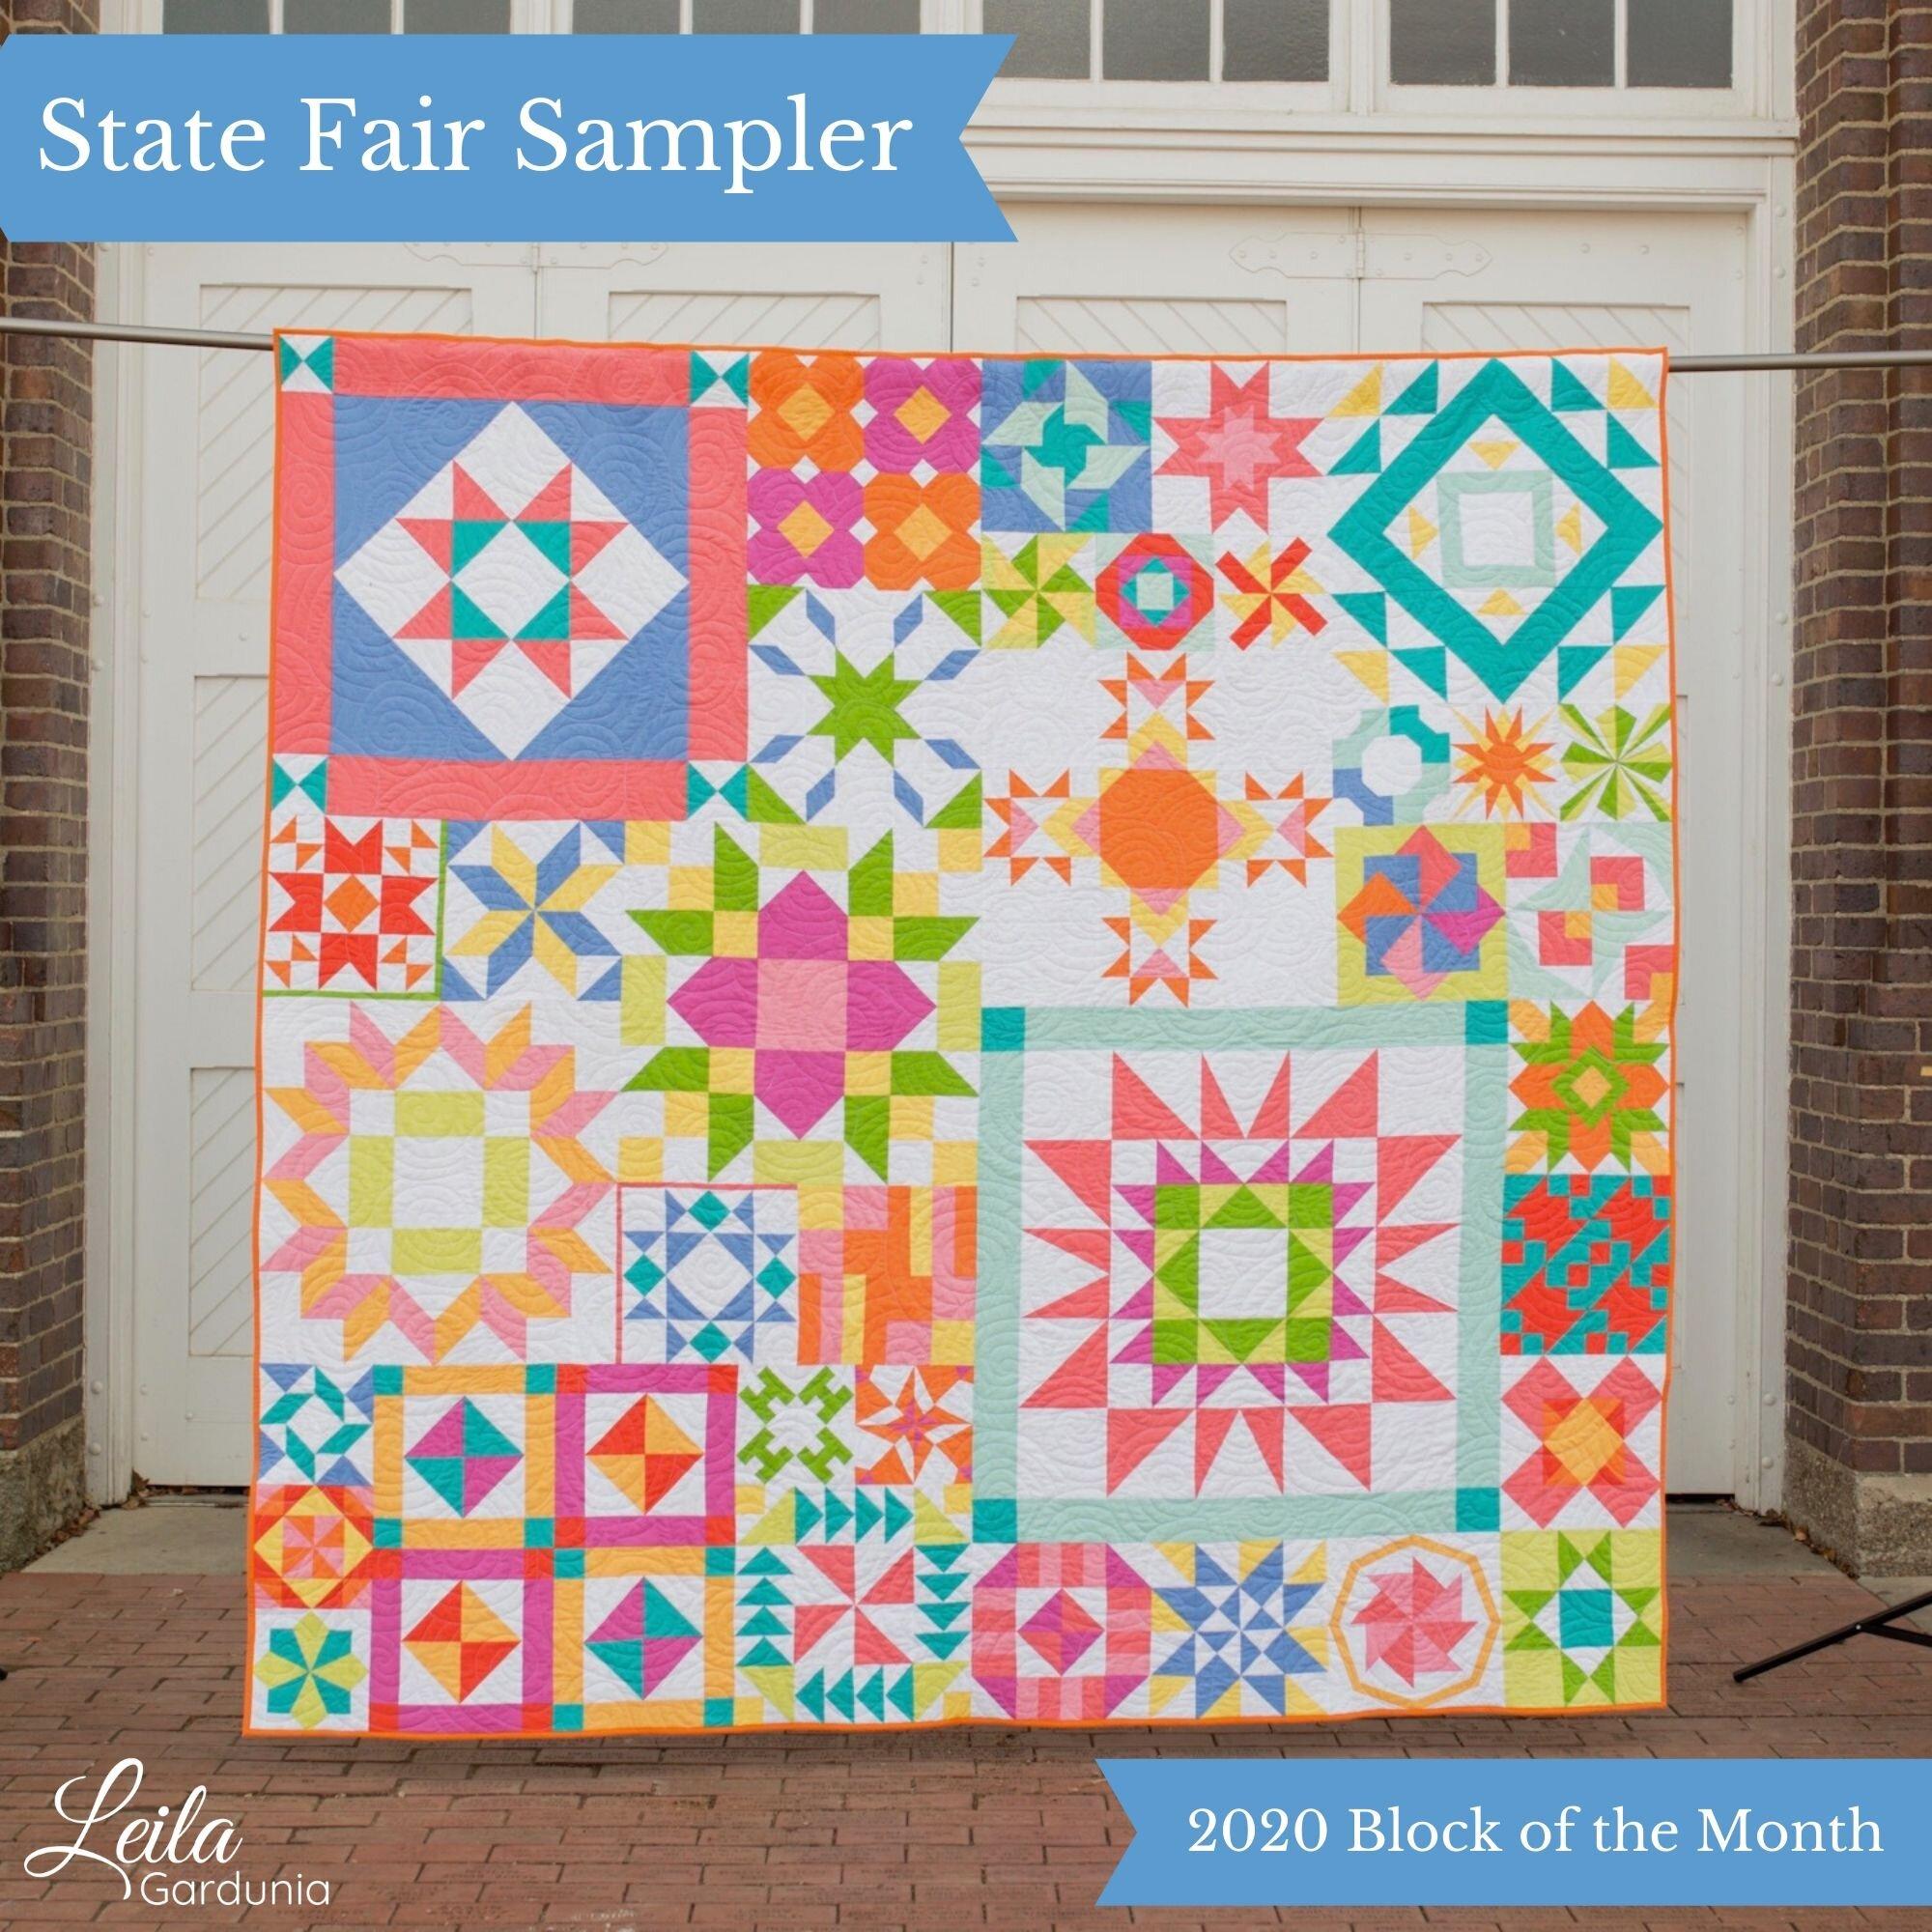 State Fair Sampler 2020 Block of the Month Quilt.jpg